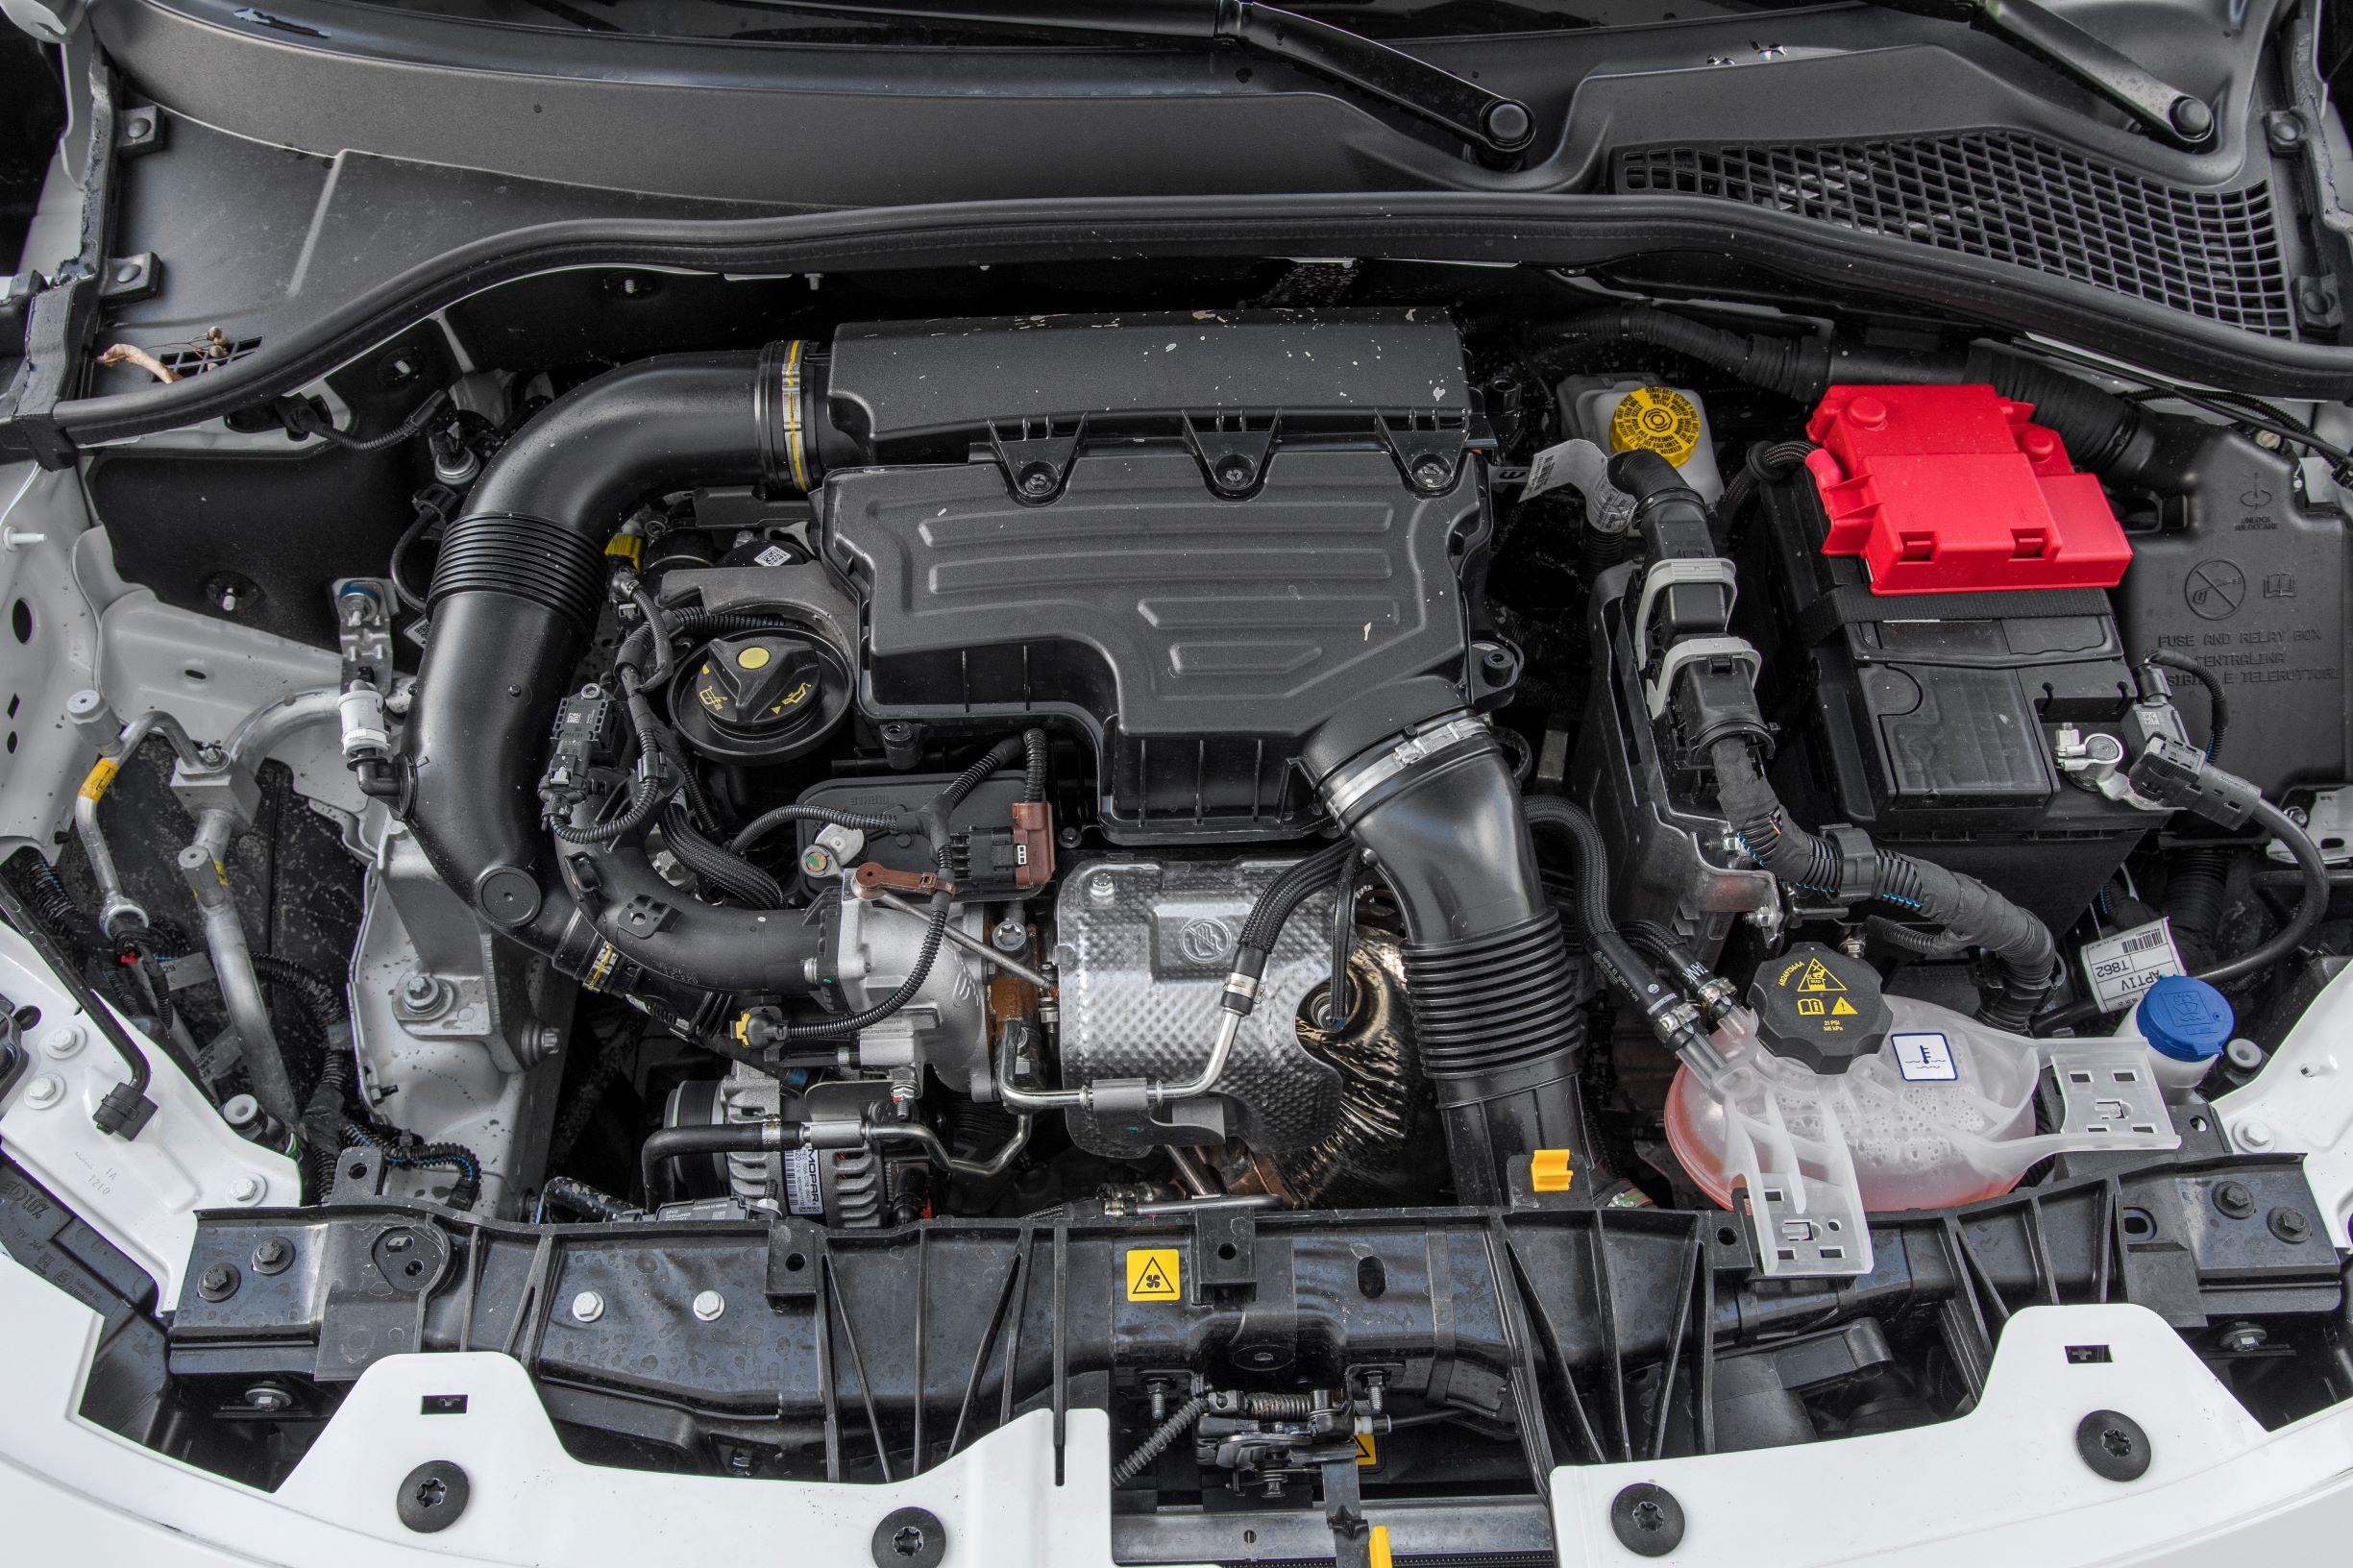 Fiat Tipo Cross - silnik 1.0 T3 Turbo o mocy 100 KM